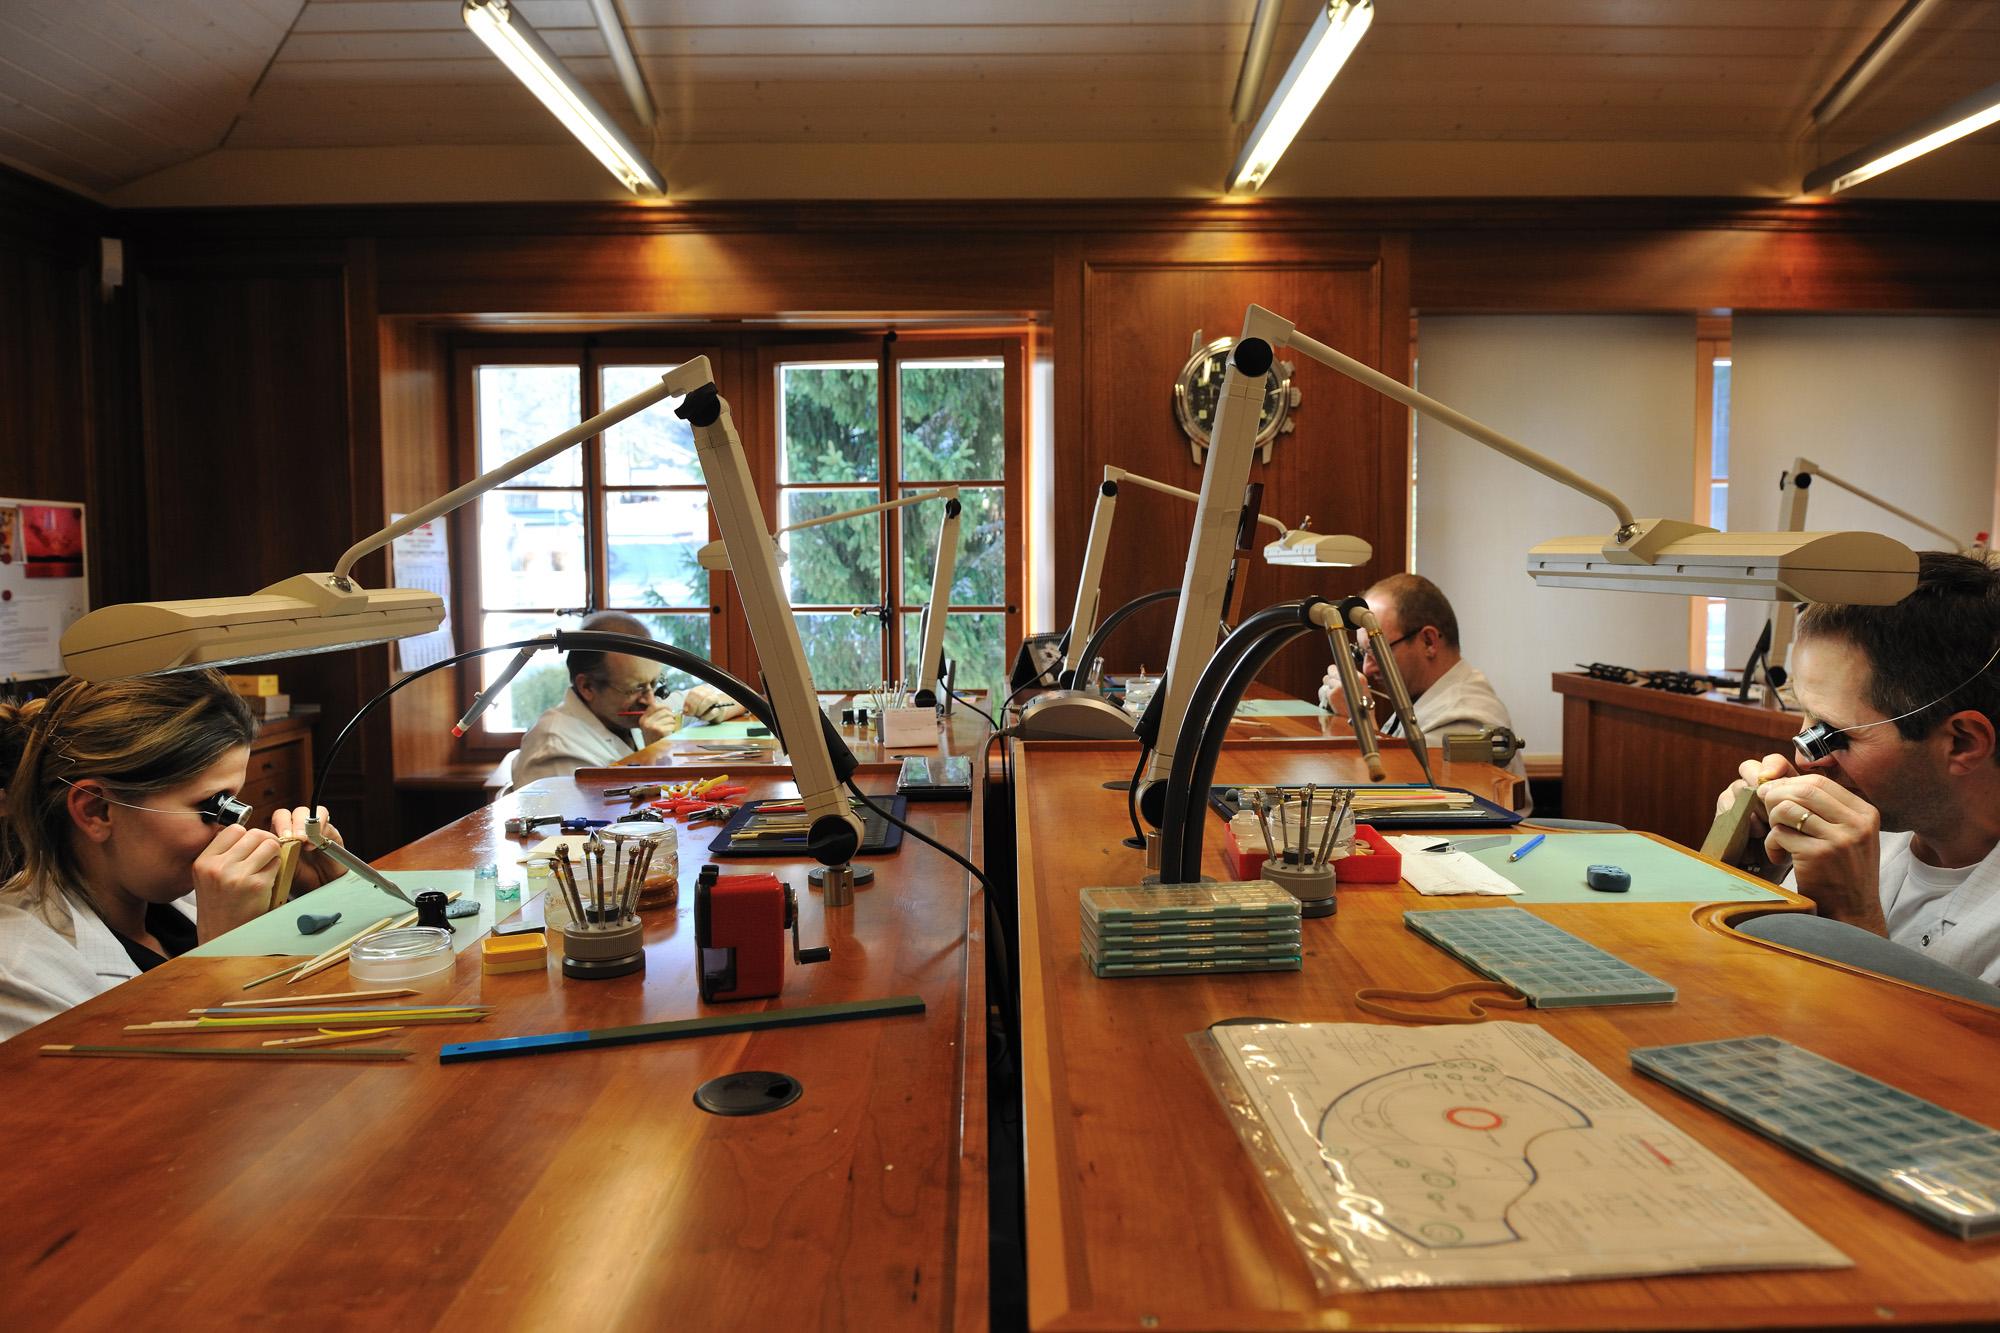 Blancpain Manufacture - Atelier Decoration